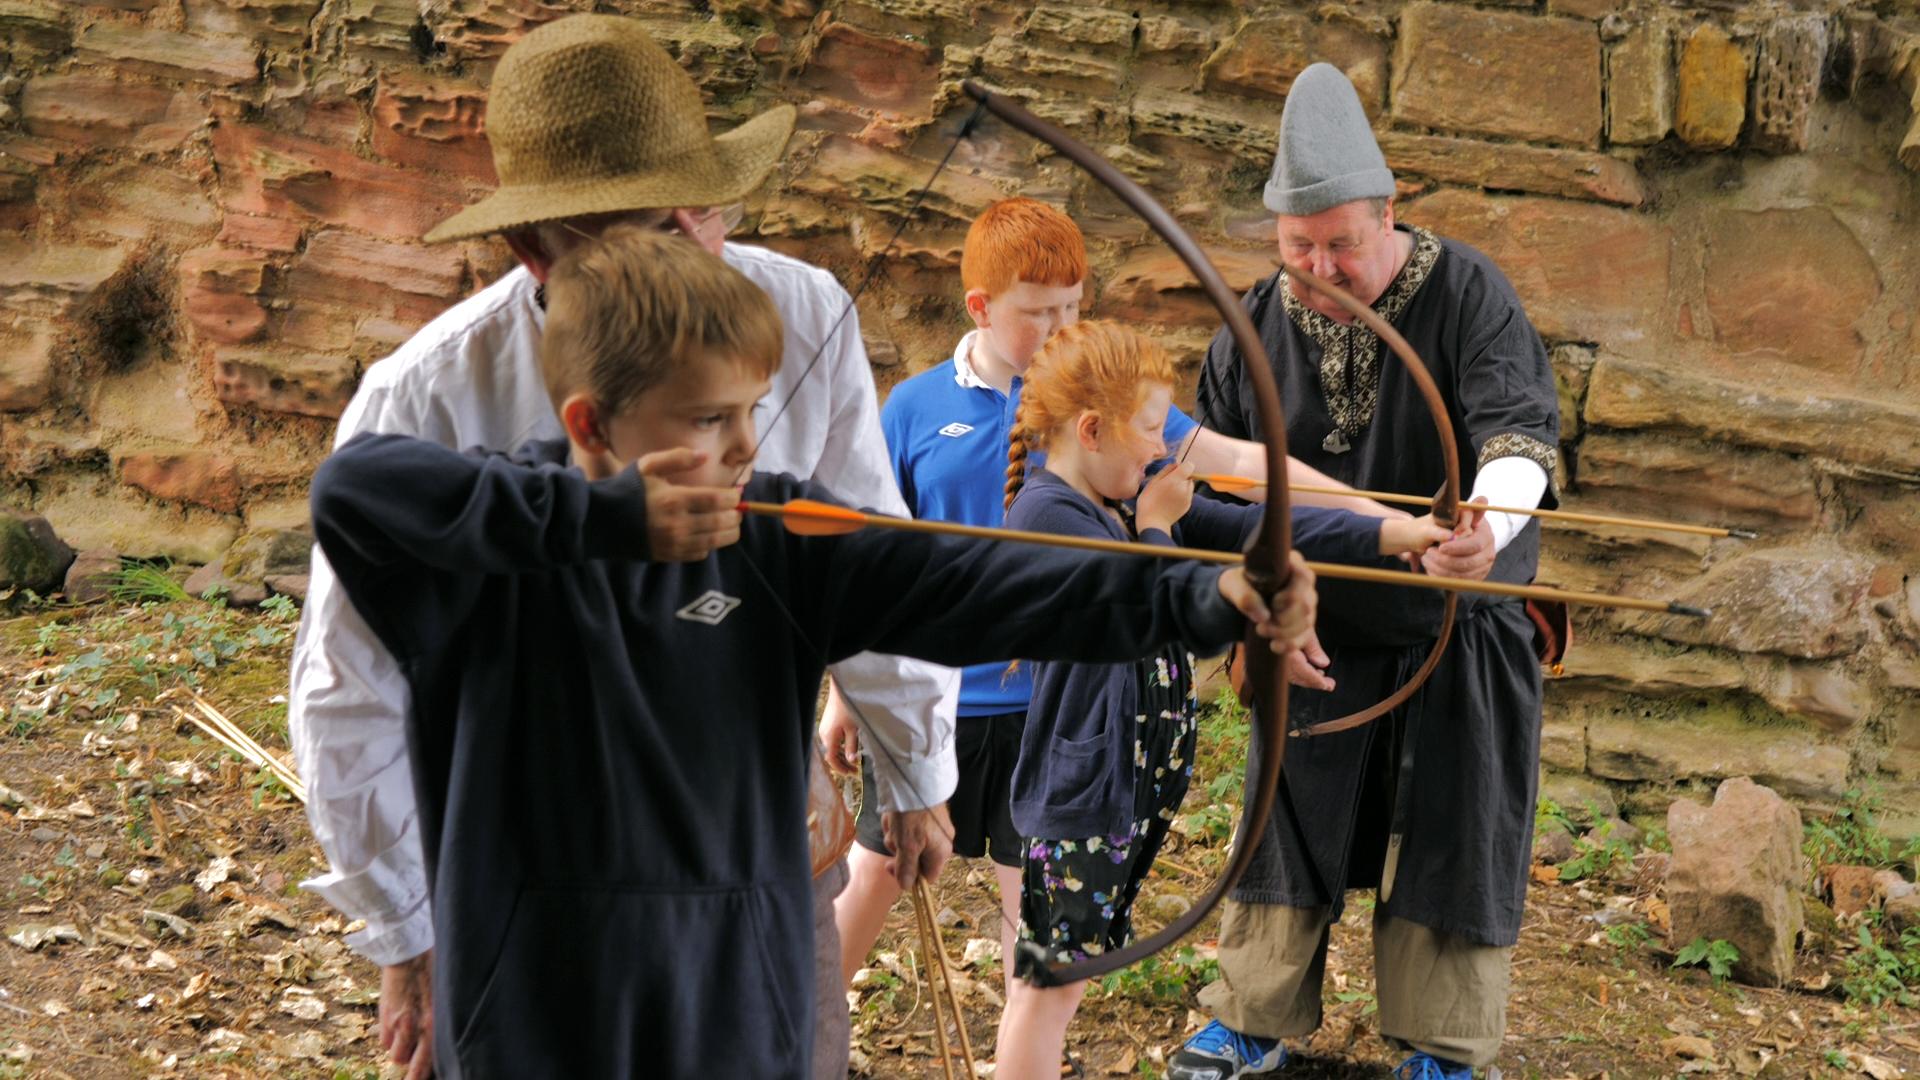 Archery at Macduff Castle